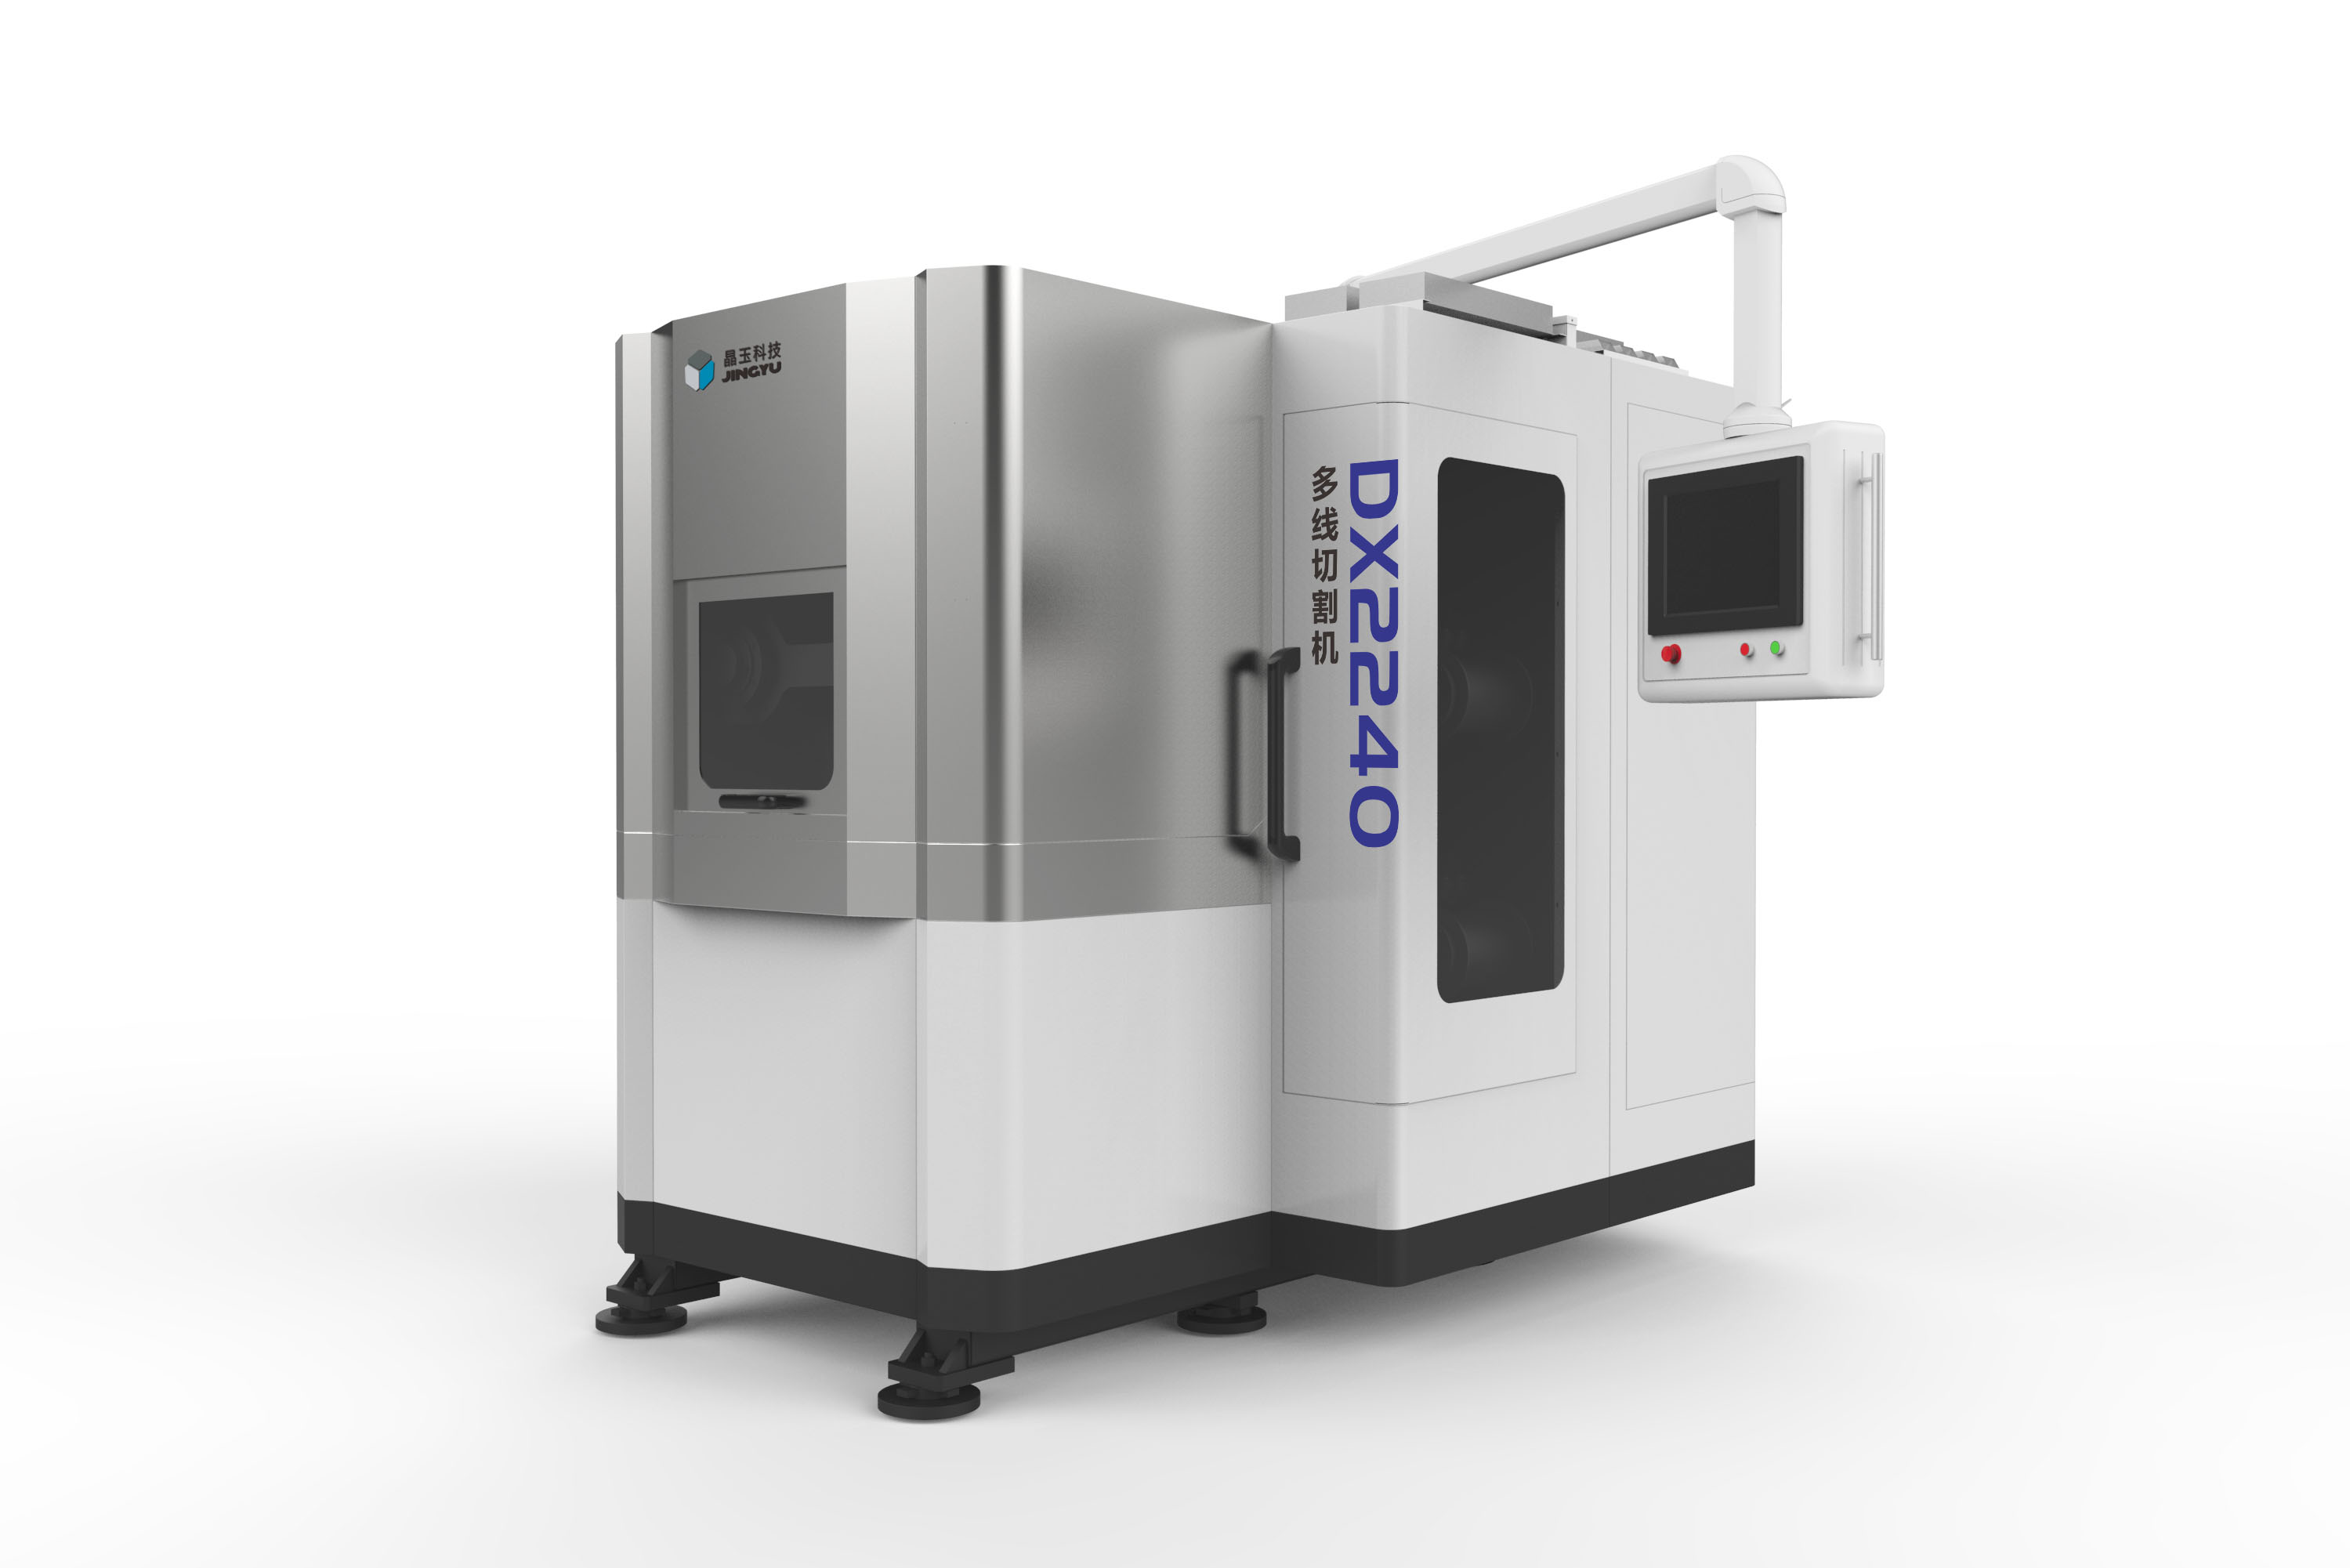 DX2240